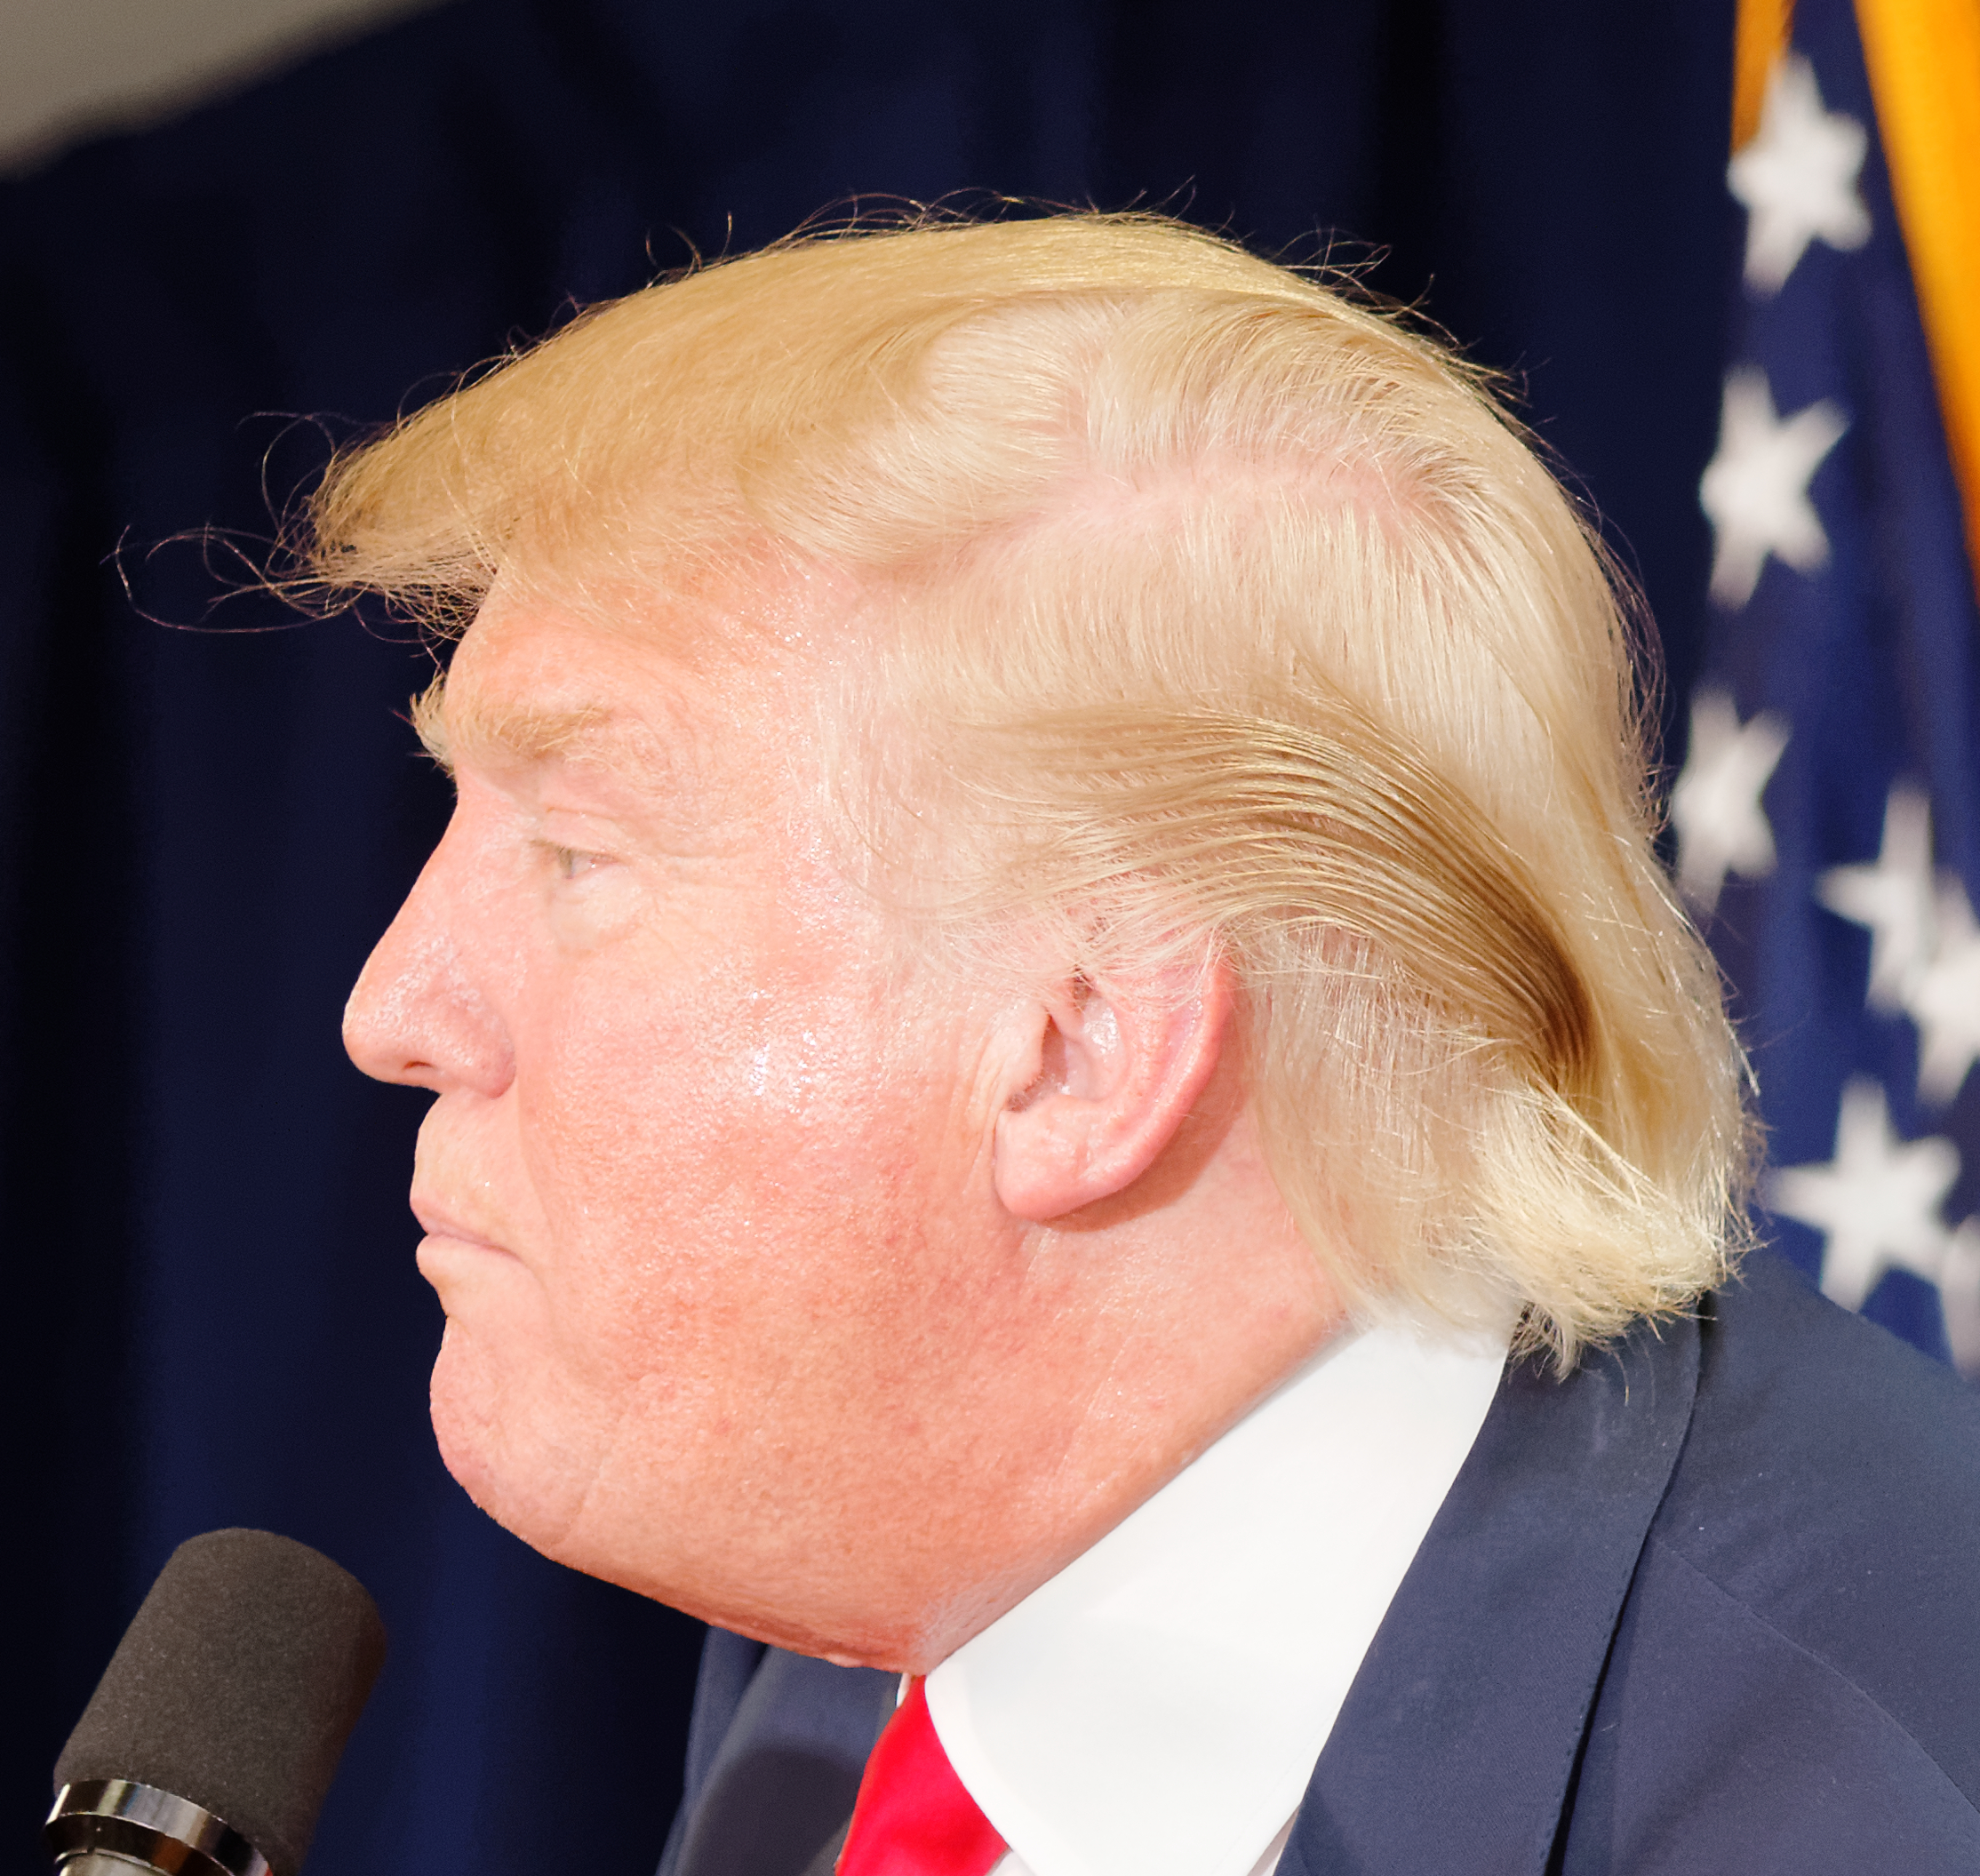 filedonald trump haircut laconia by michael vadon july